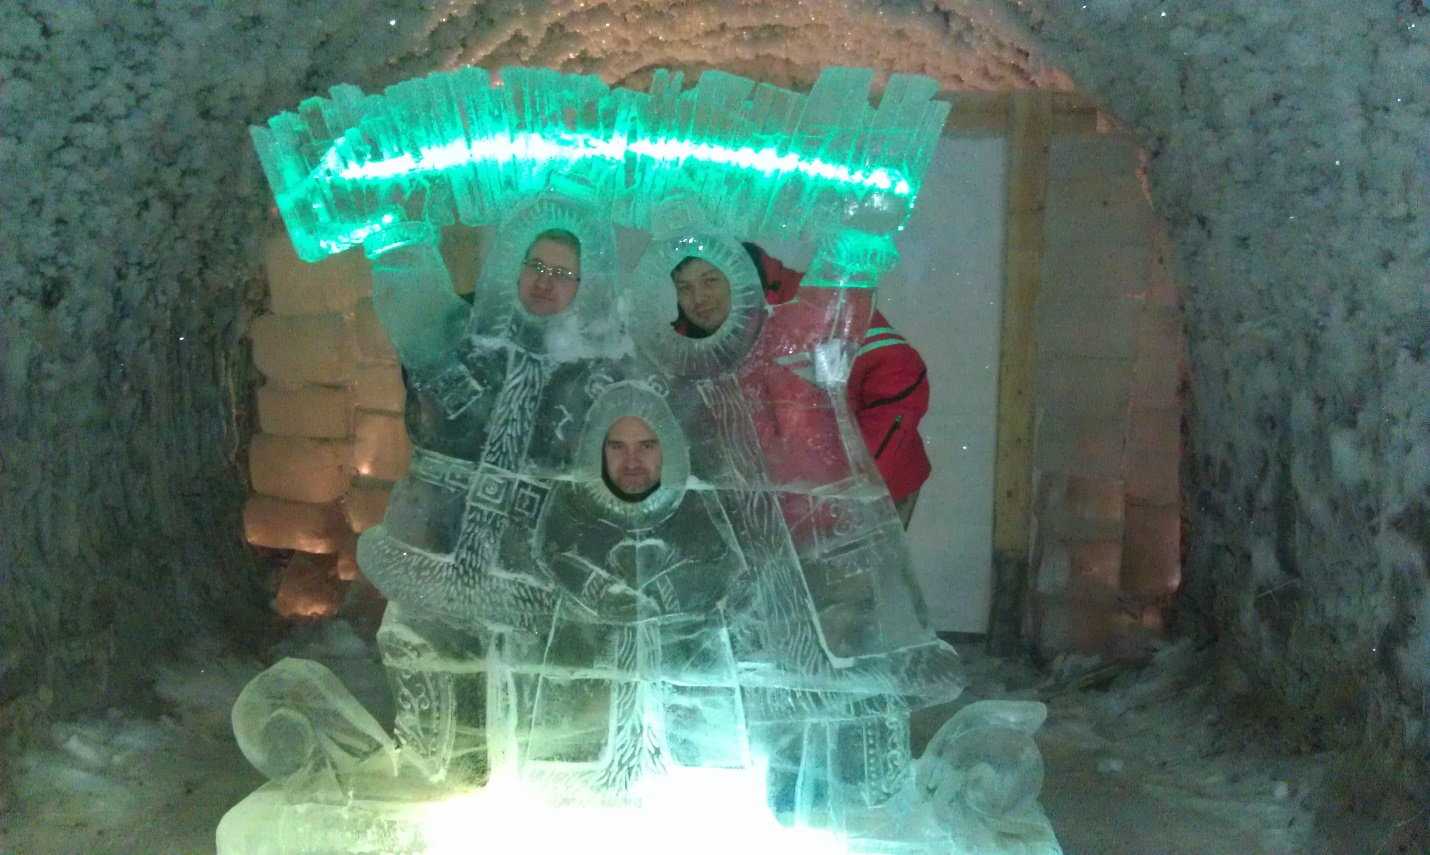 Инженерный спецназ: жара и холод - 5